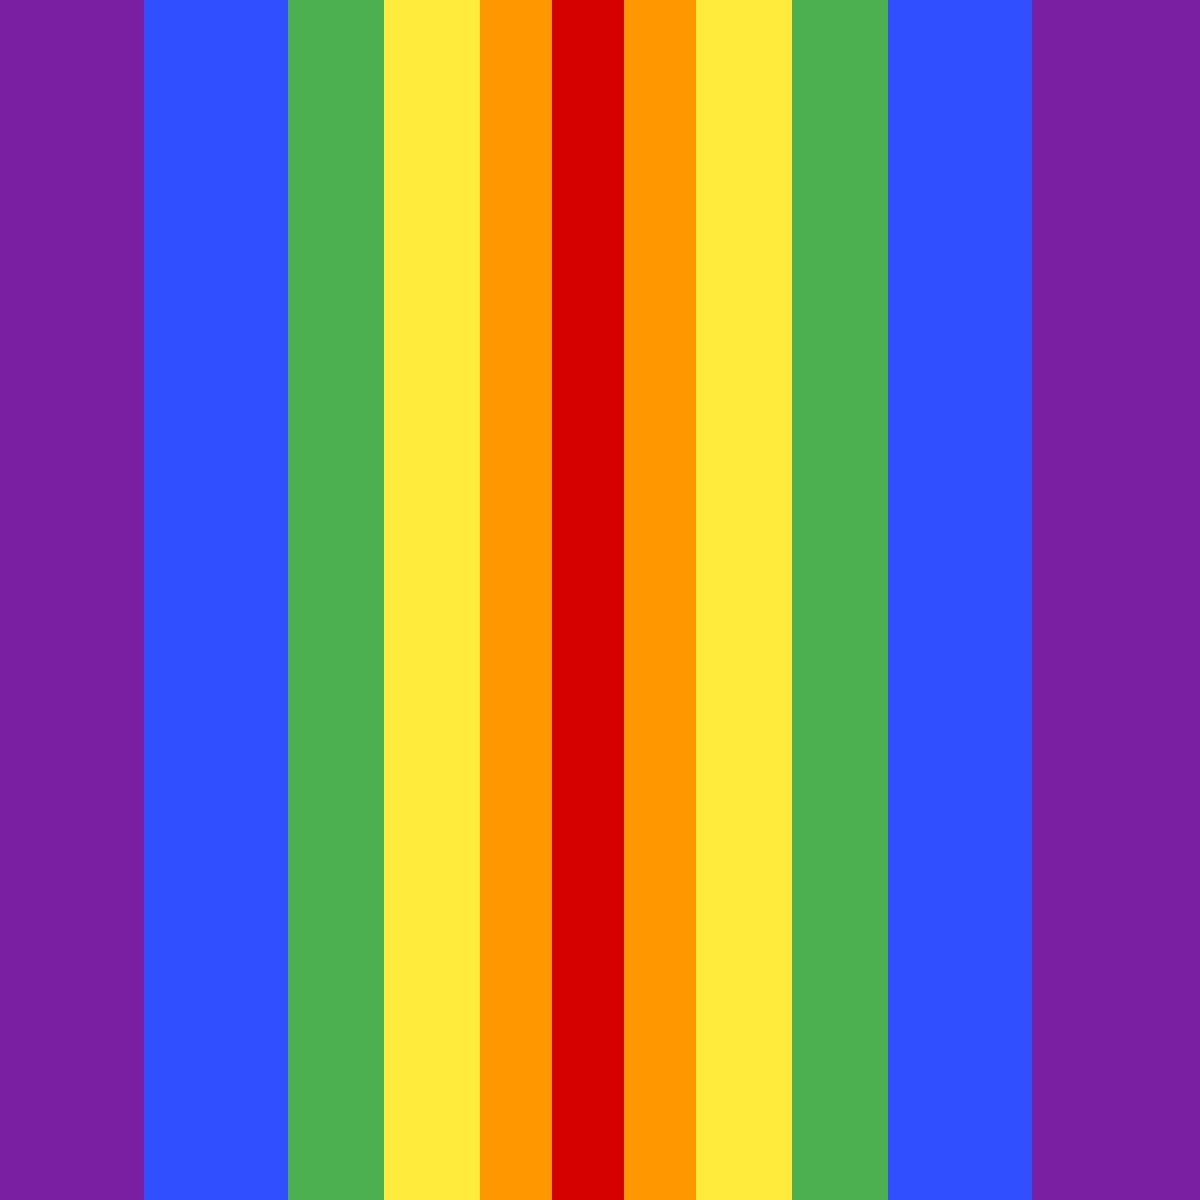 strait rainbow by wolflover938